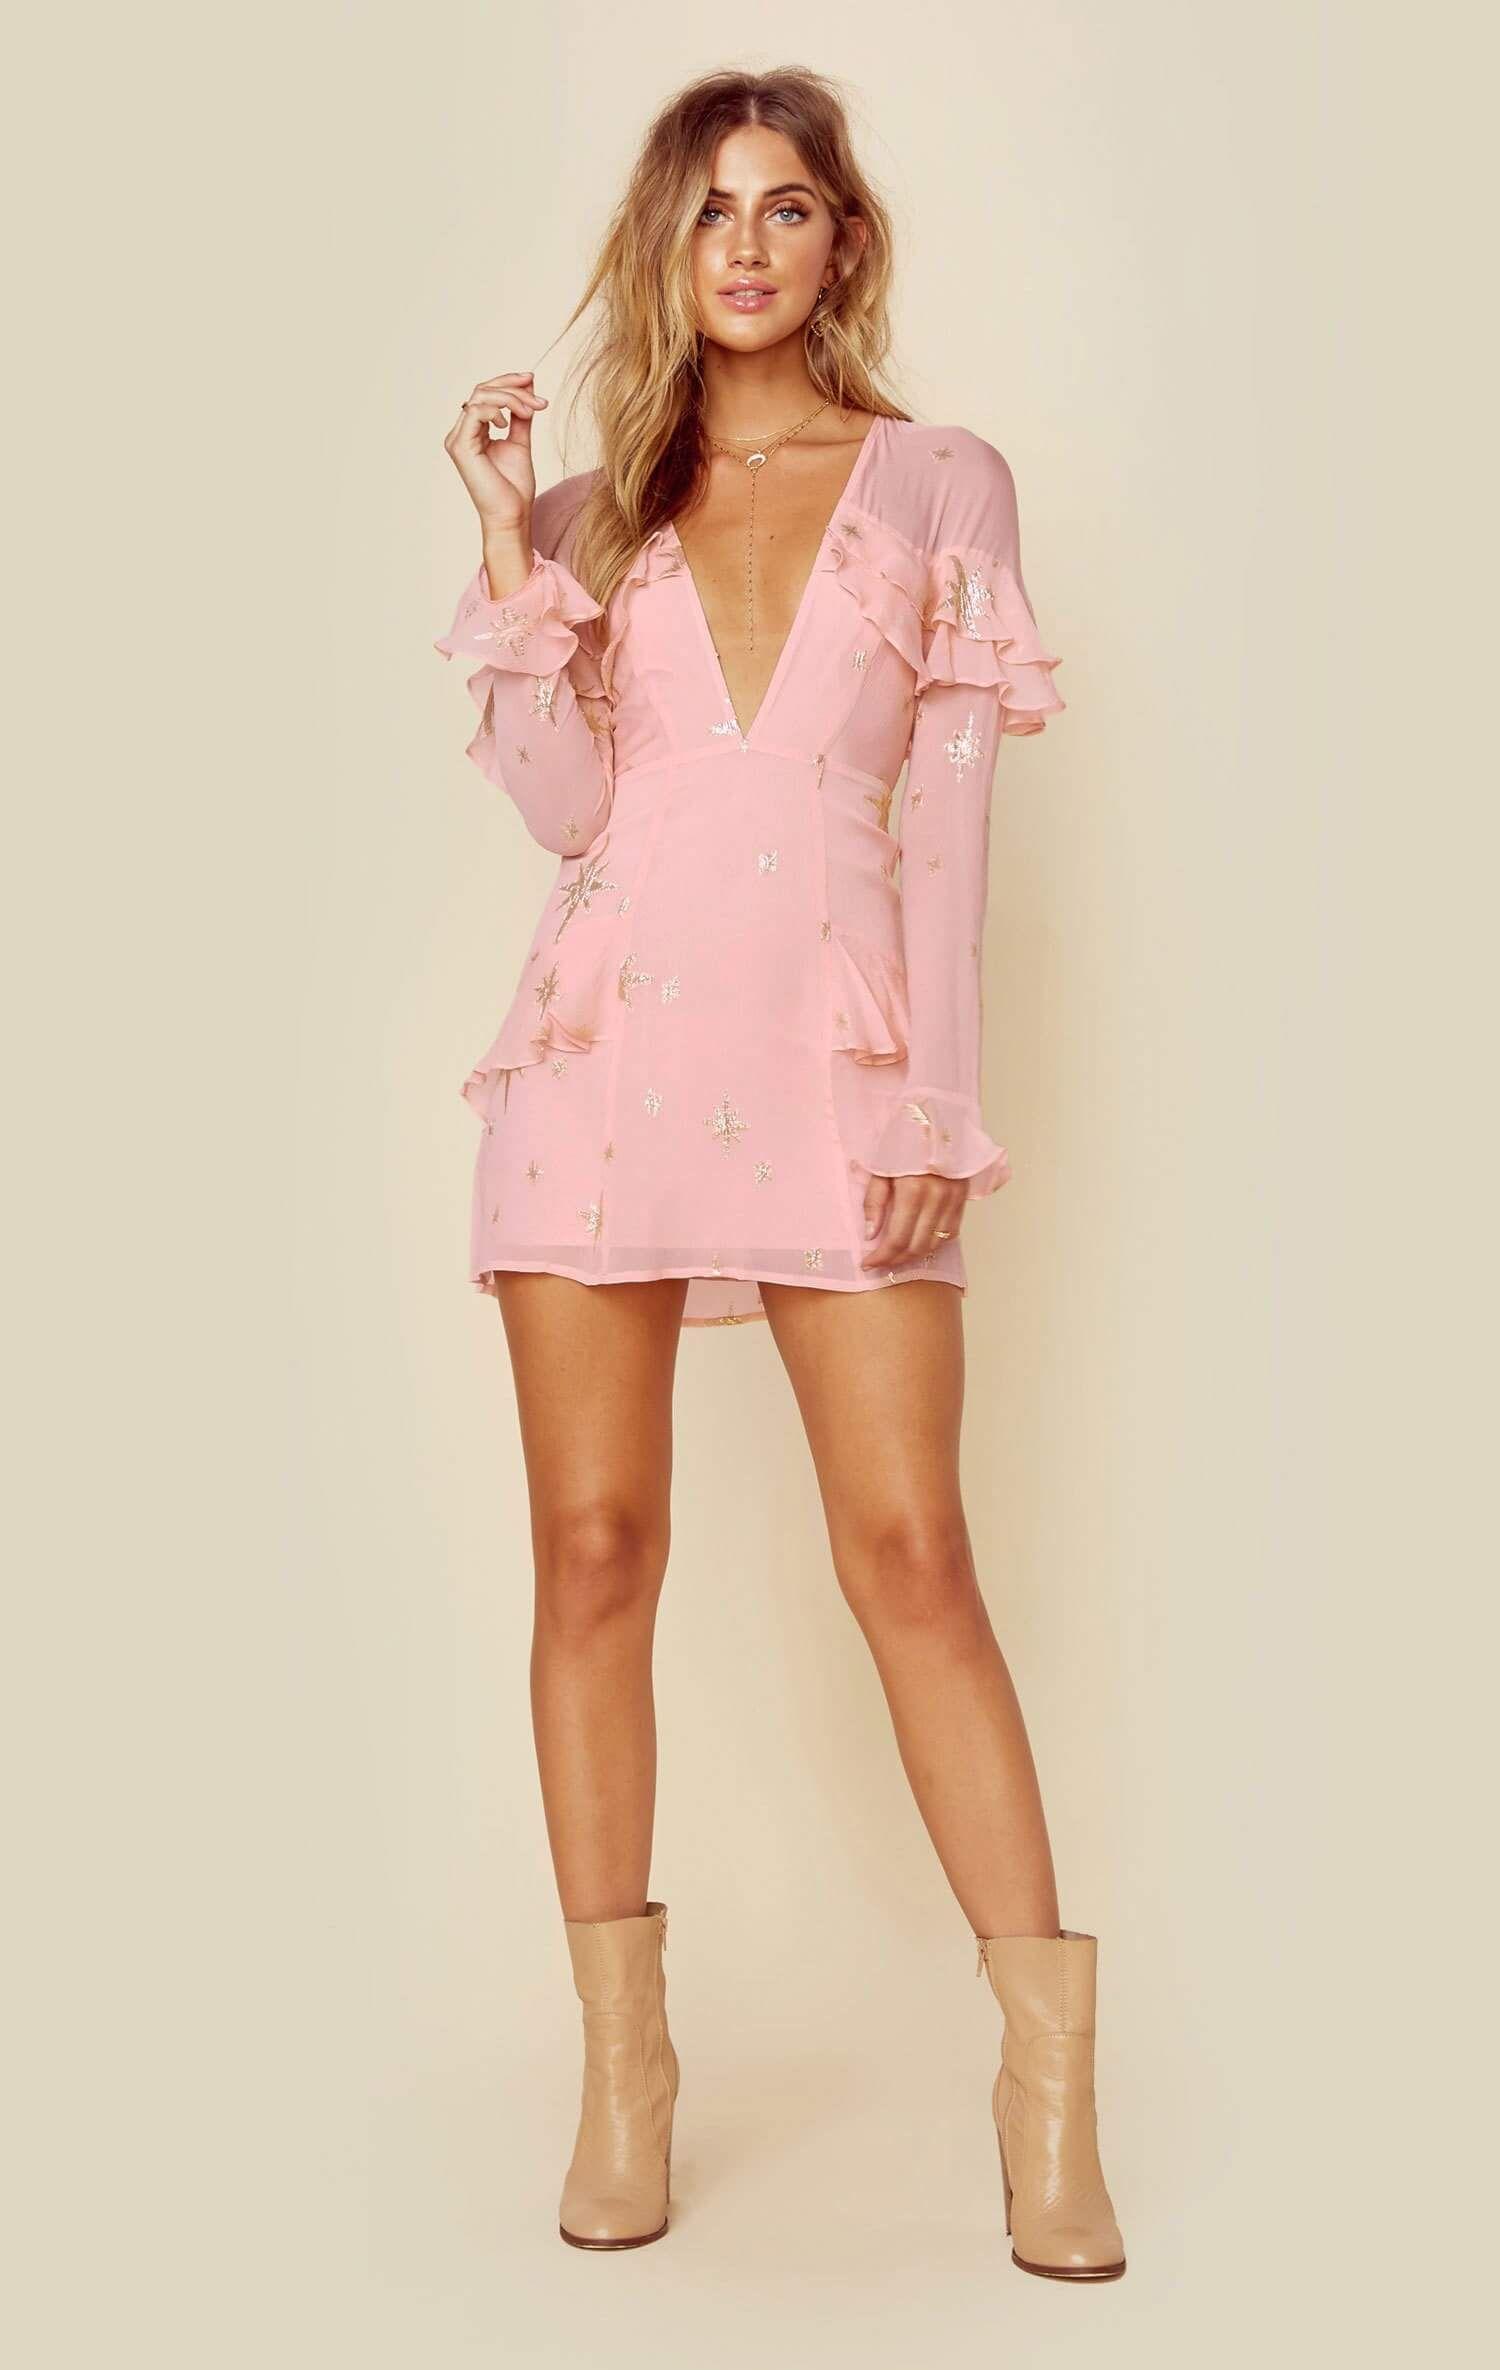 Gilded star mini dress mini dresses minis and california girl style